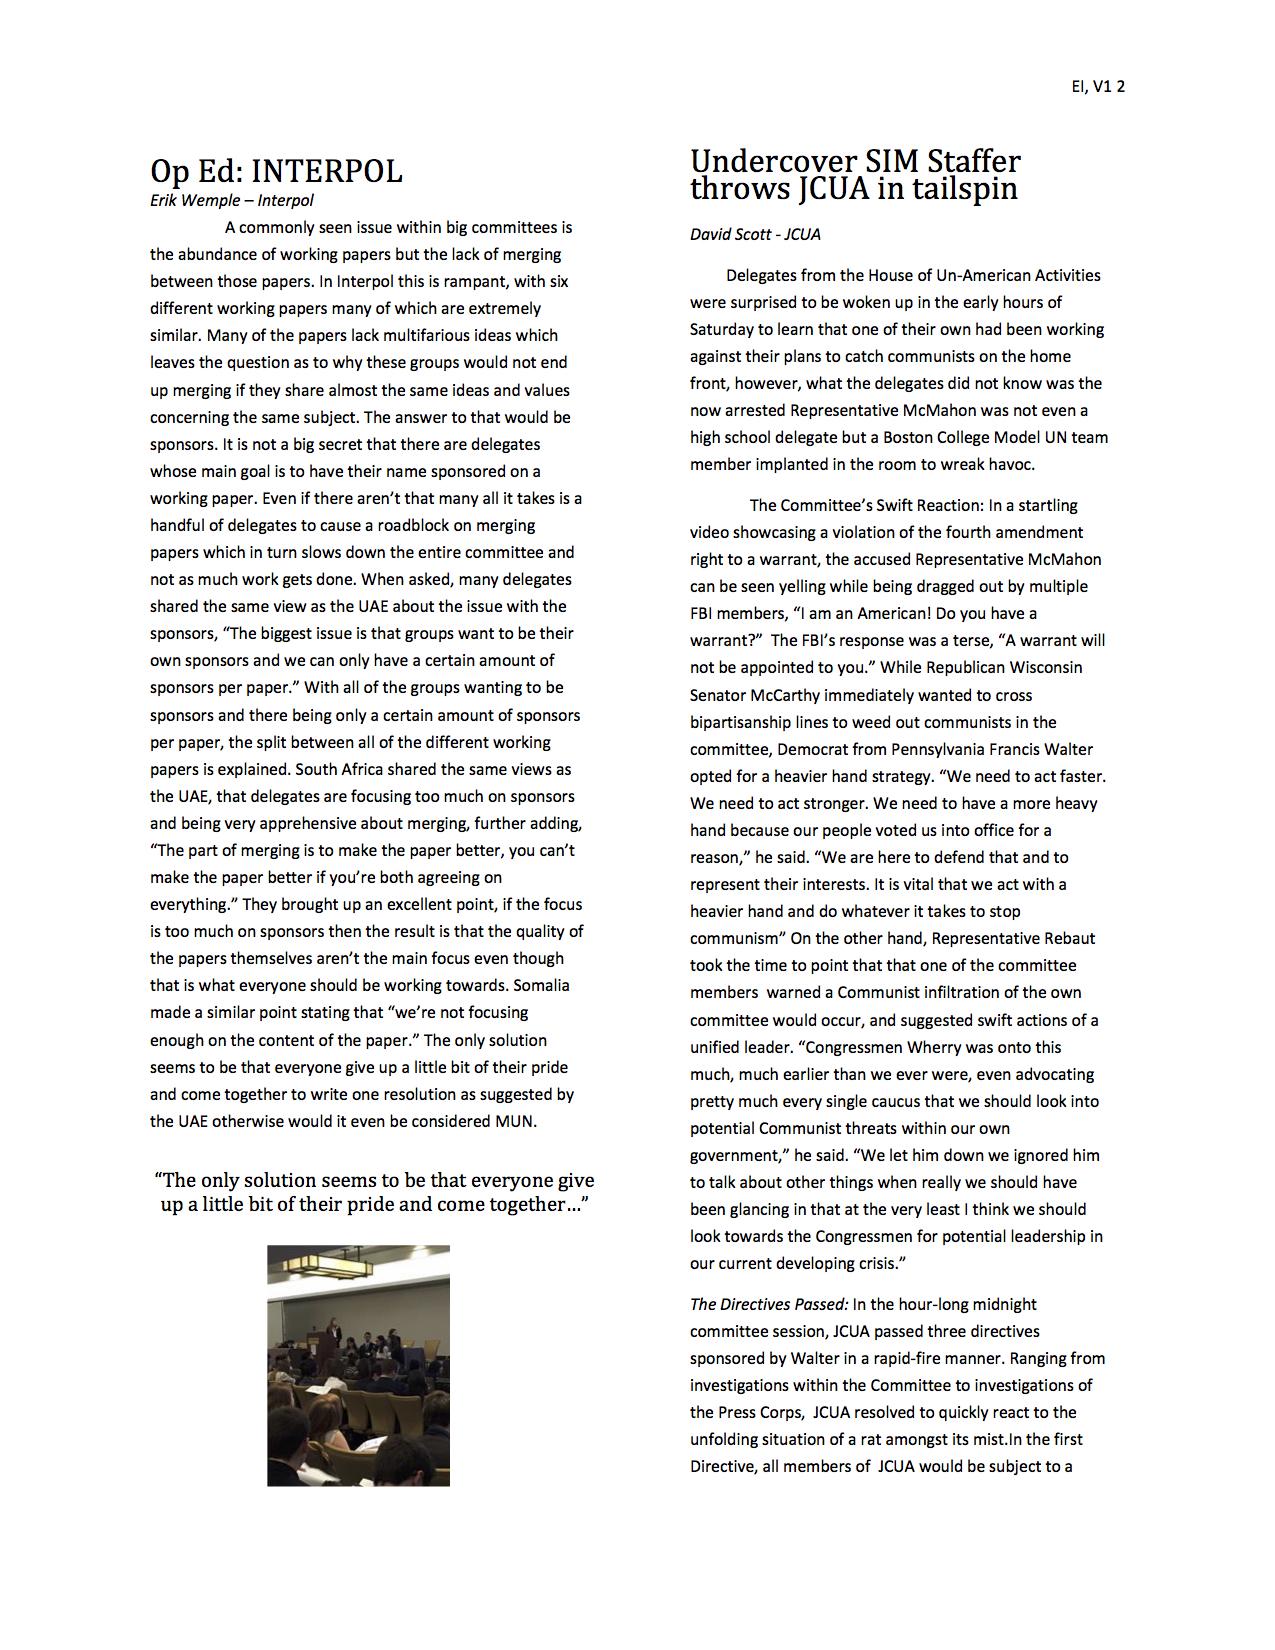 FINALEagle_International_News_(2).jpg